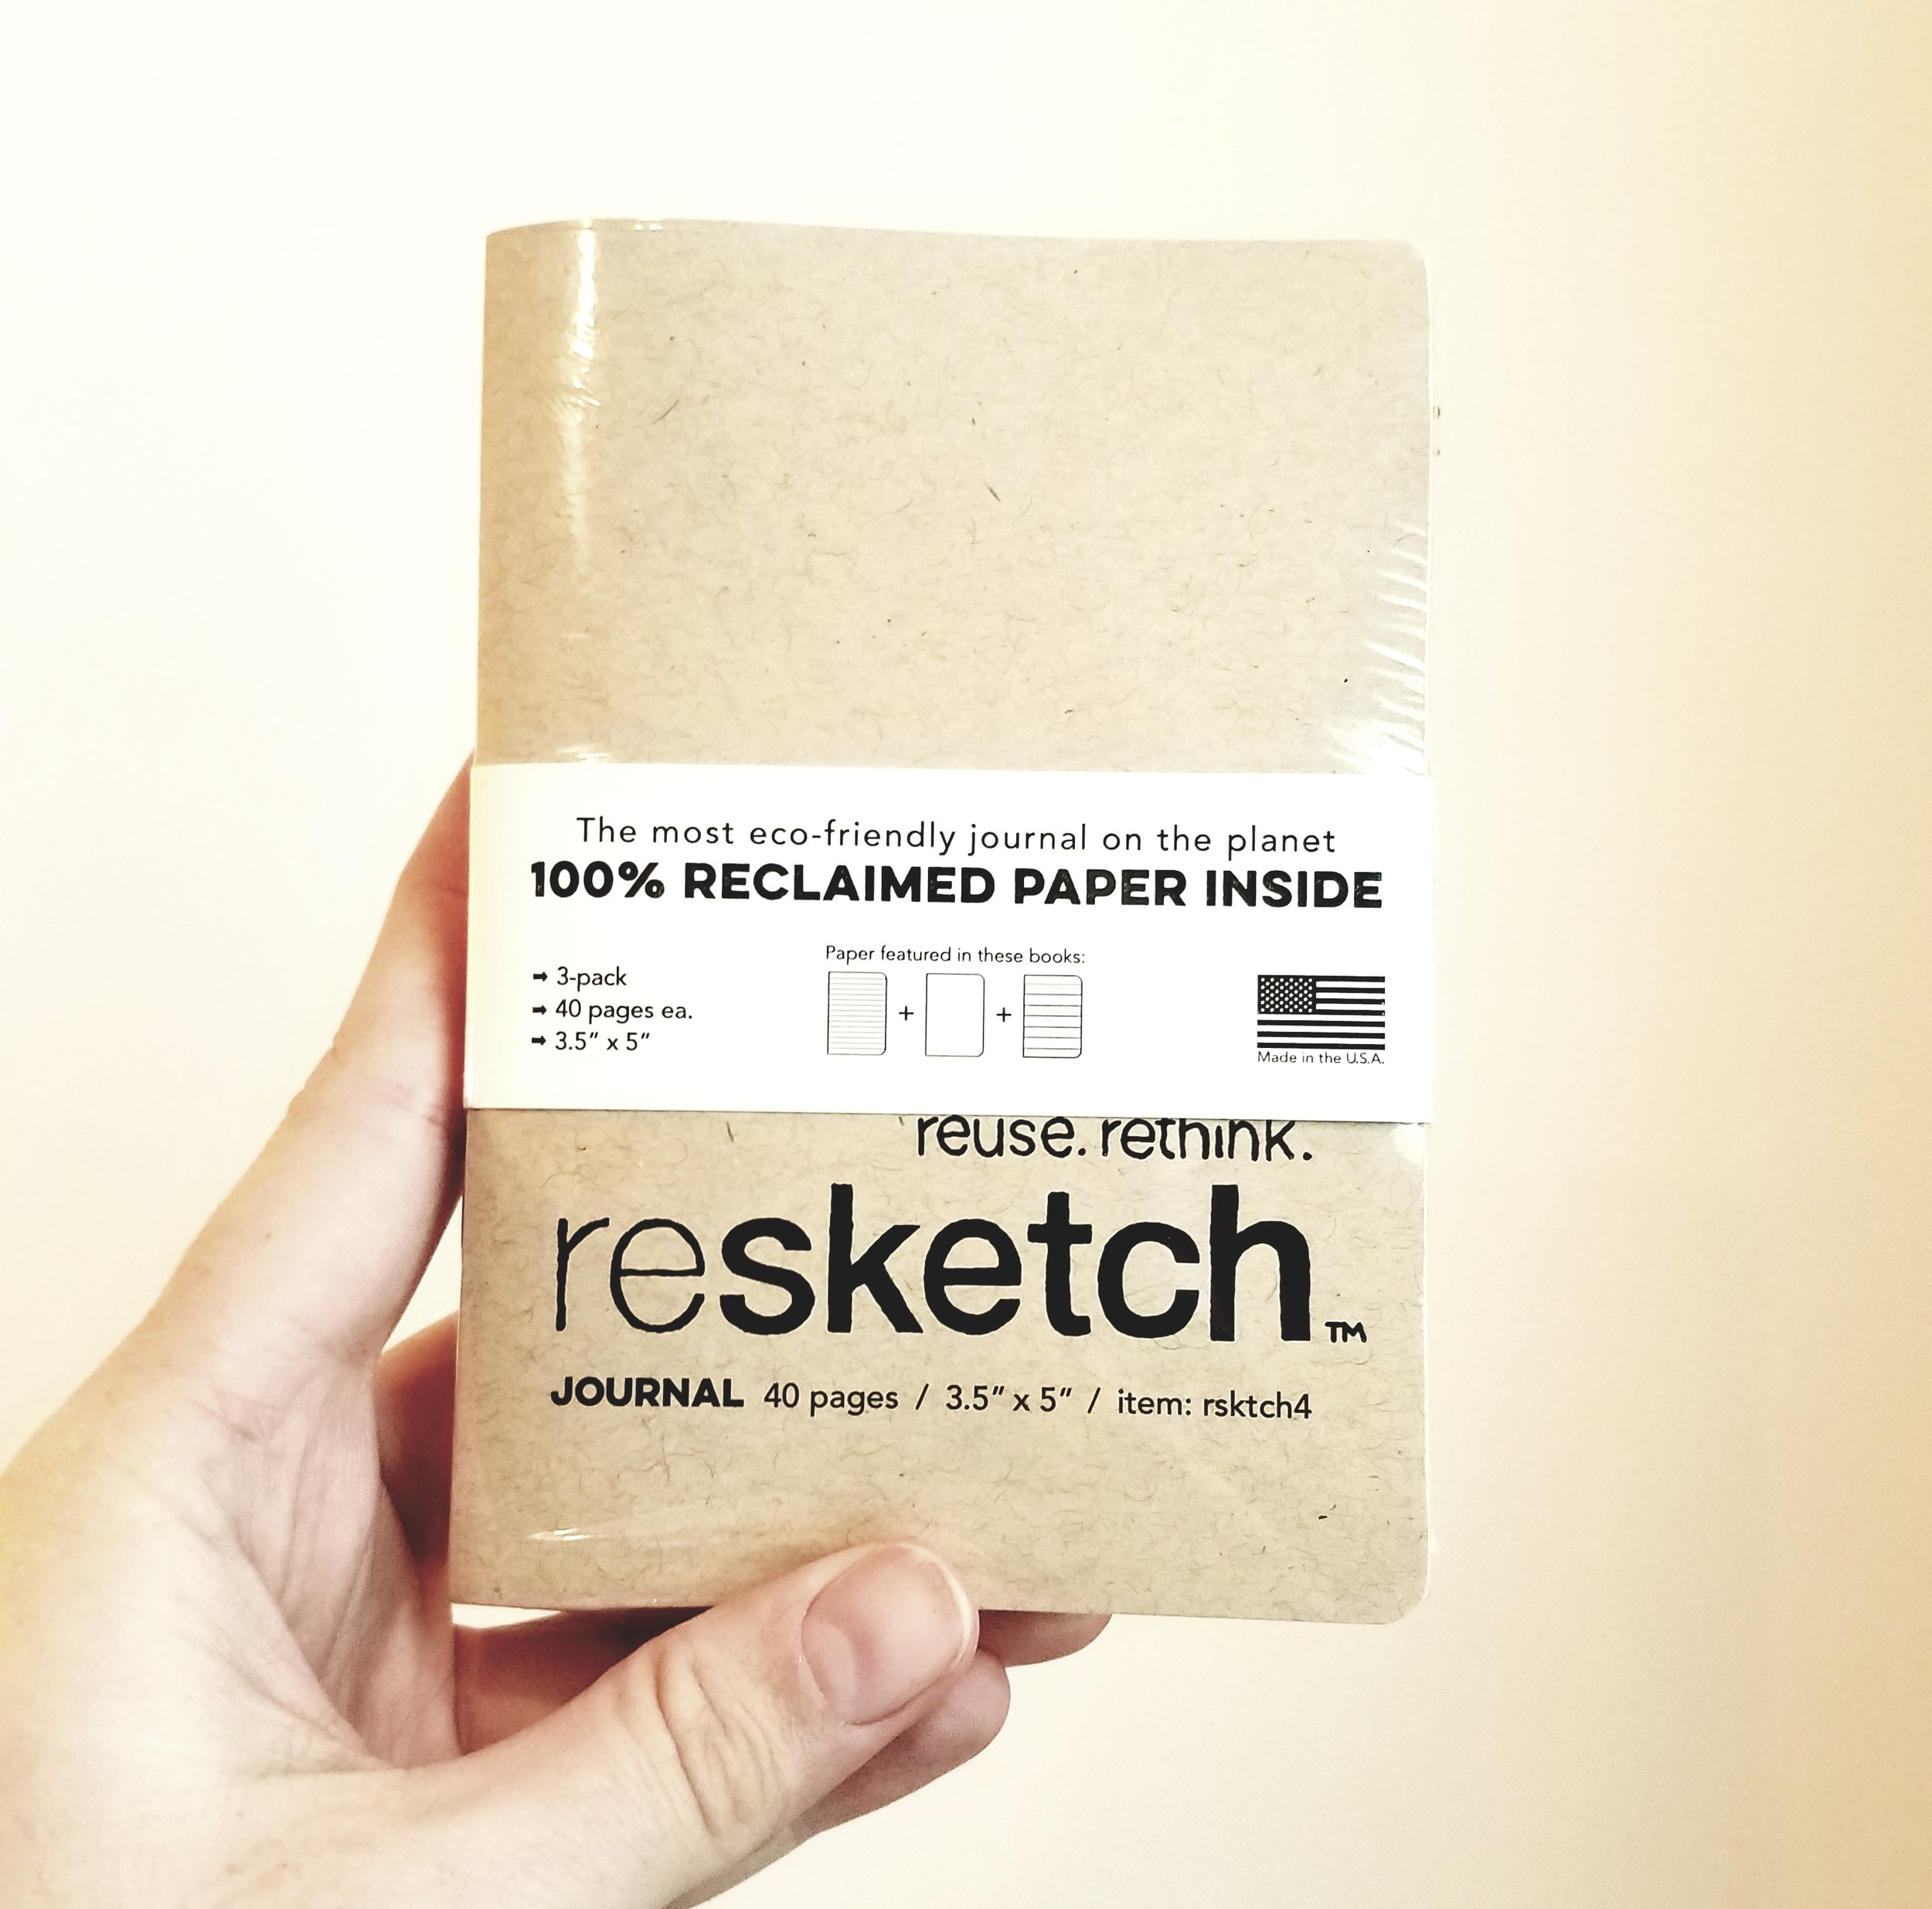 My resketch kickstarter award